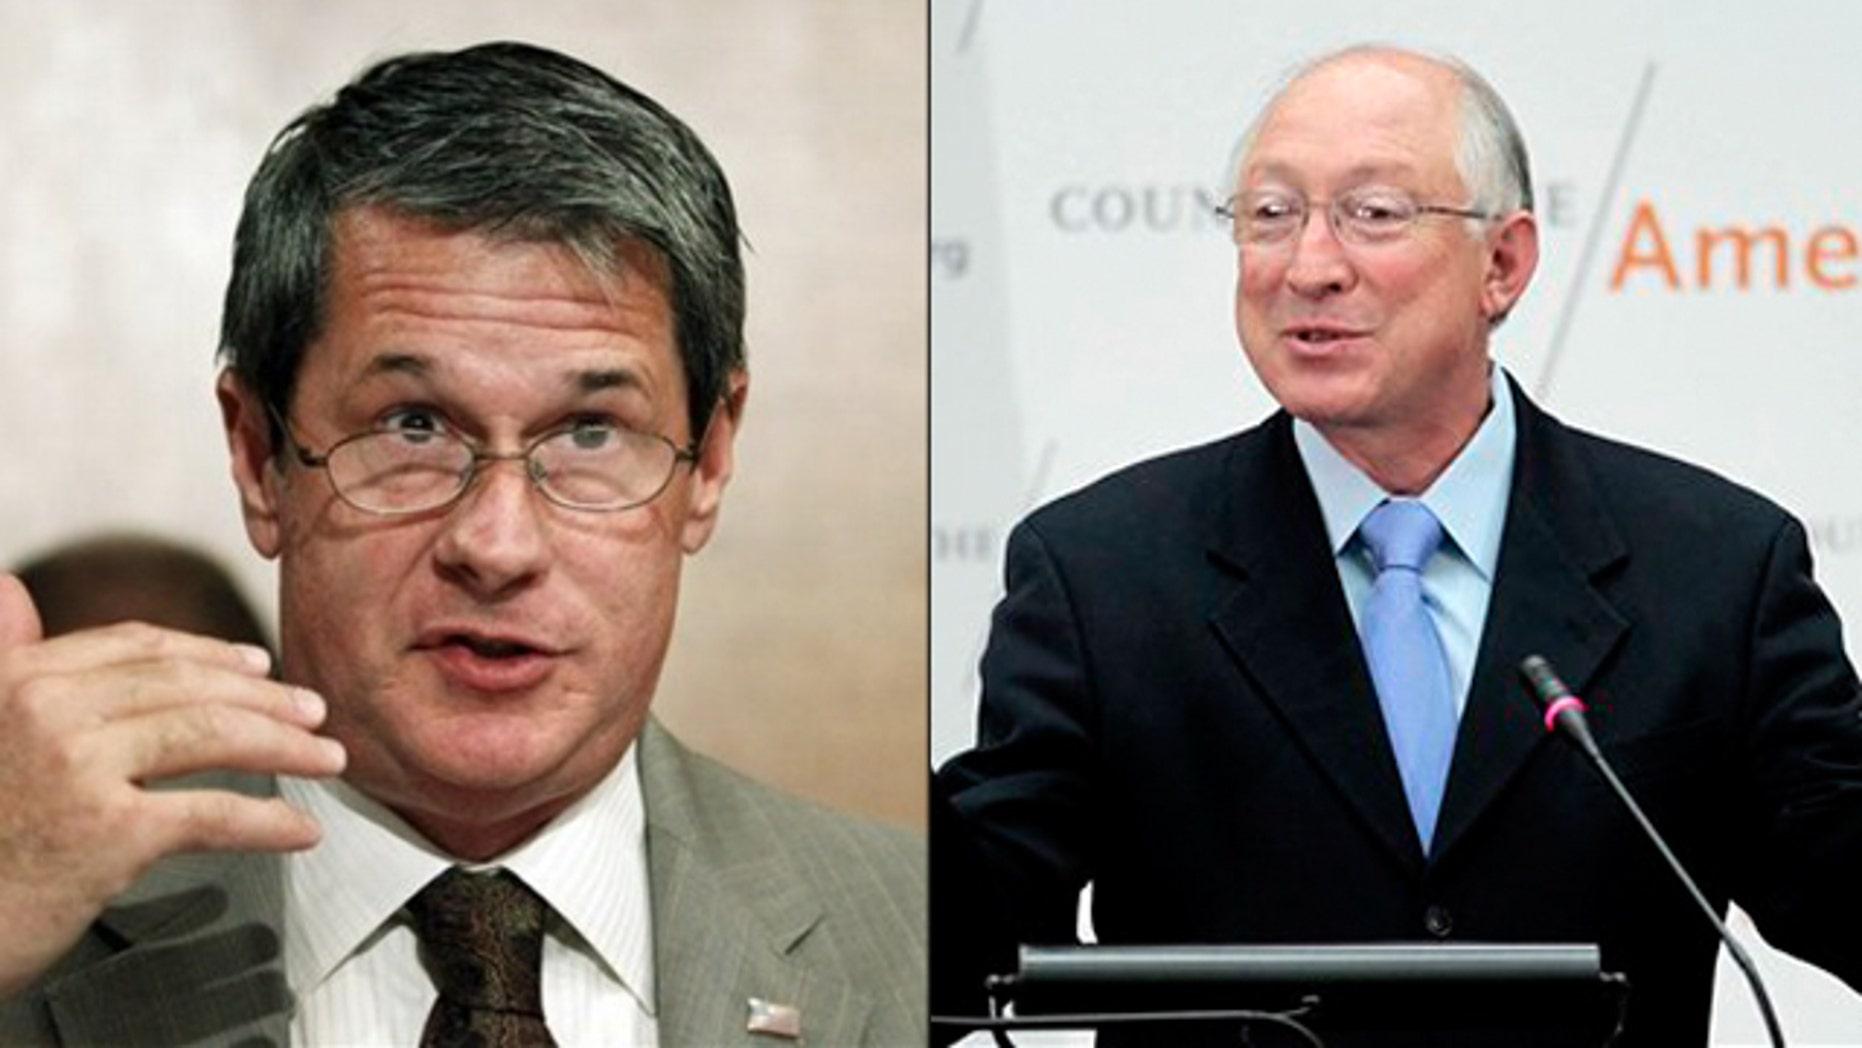 Shown here are Sen. David Vitter, left, and Interior Secretary Ken Salazar.